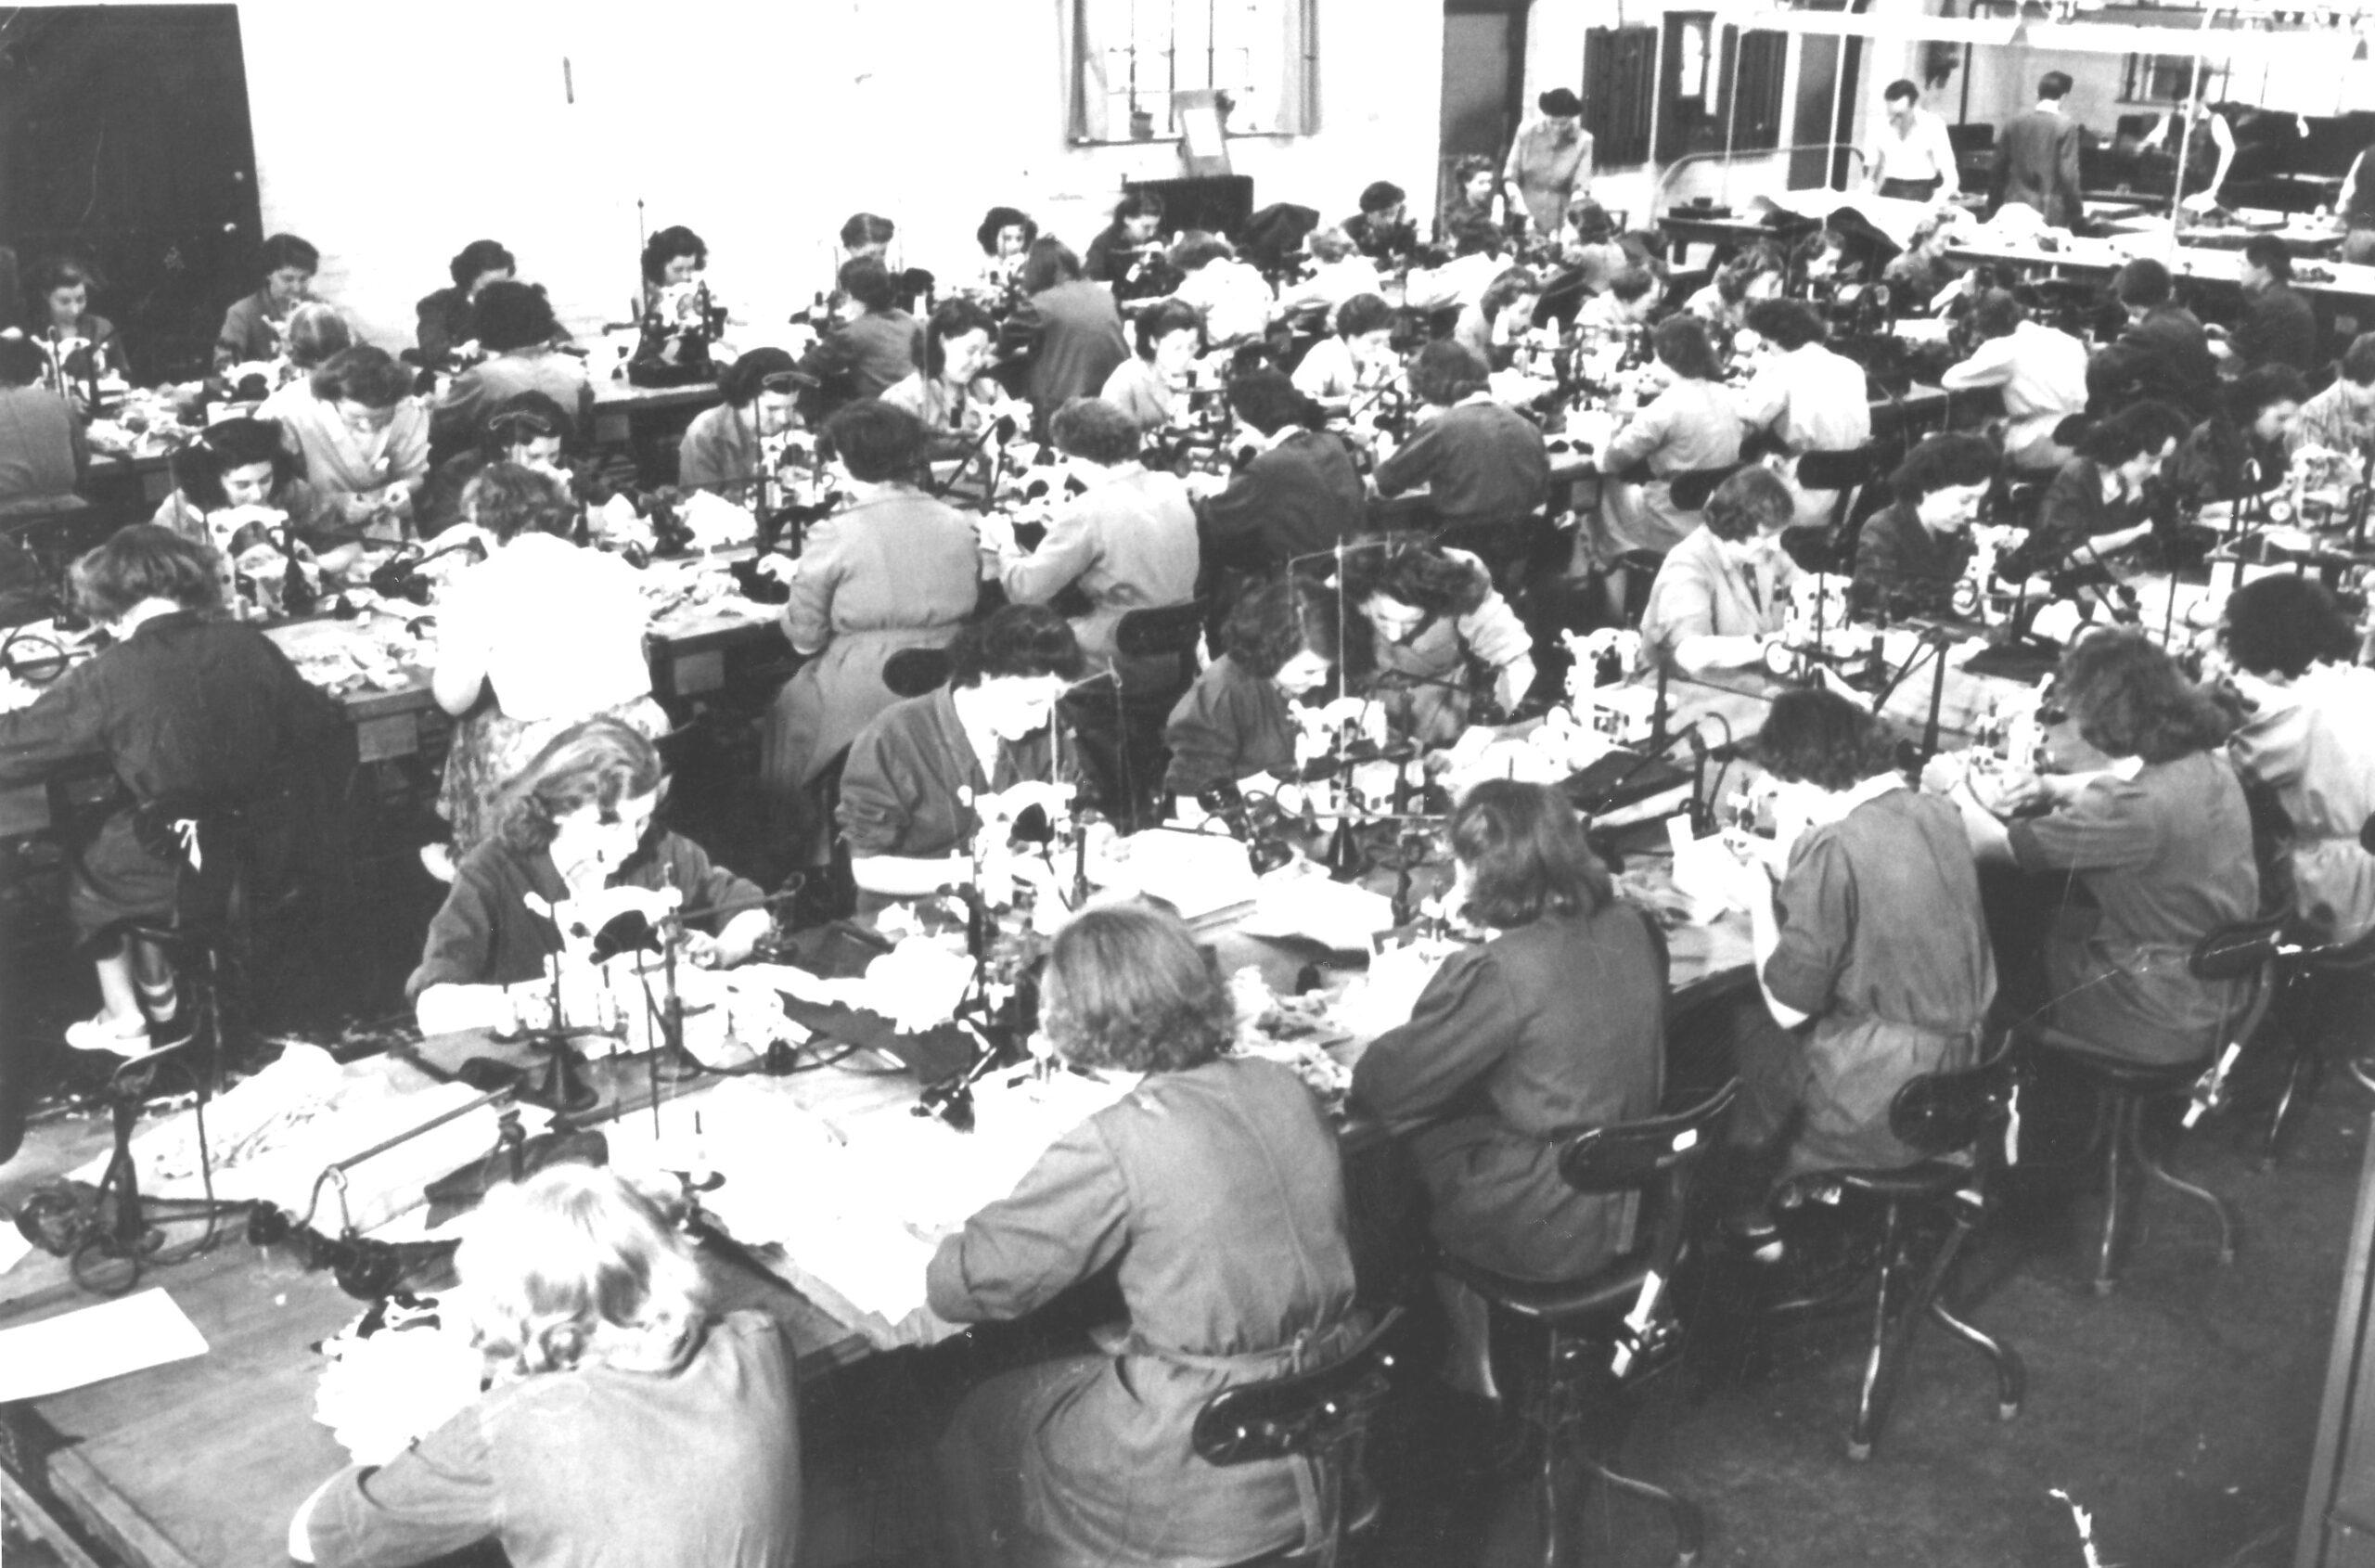 1950s machininists